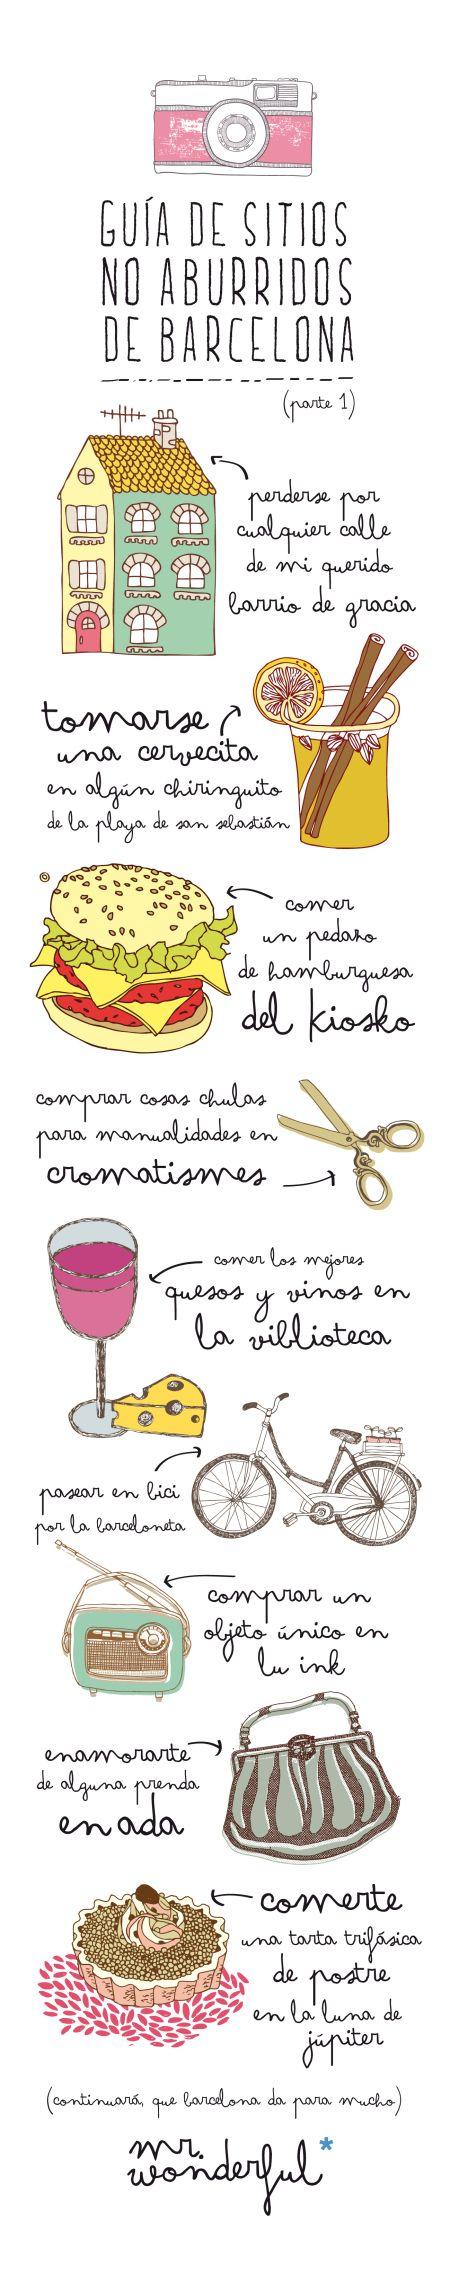 Guía ilustrada de Barcelona de Mr. Wonderful